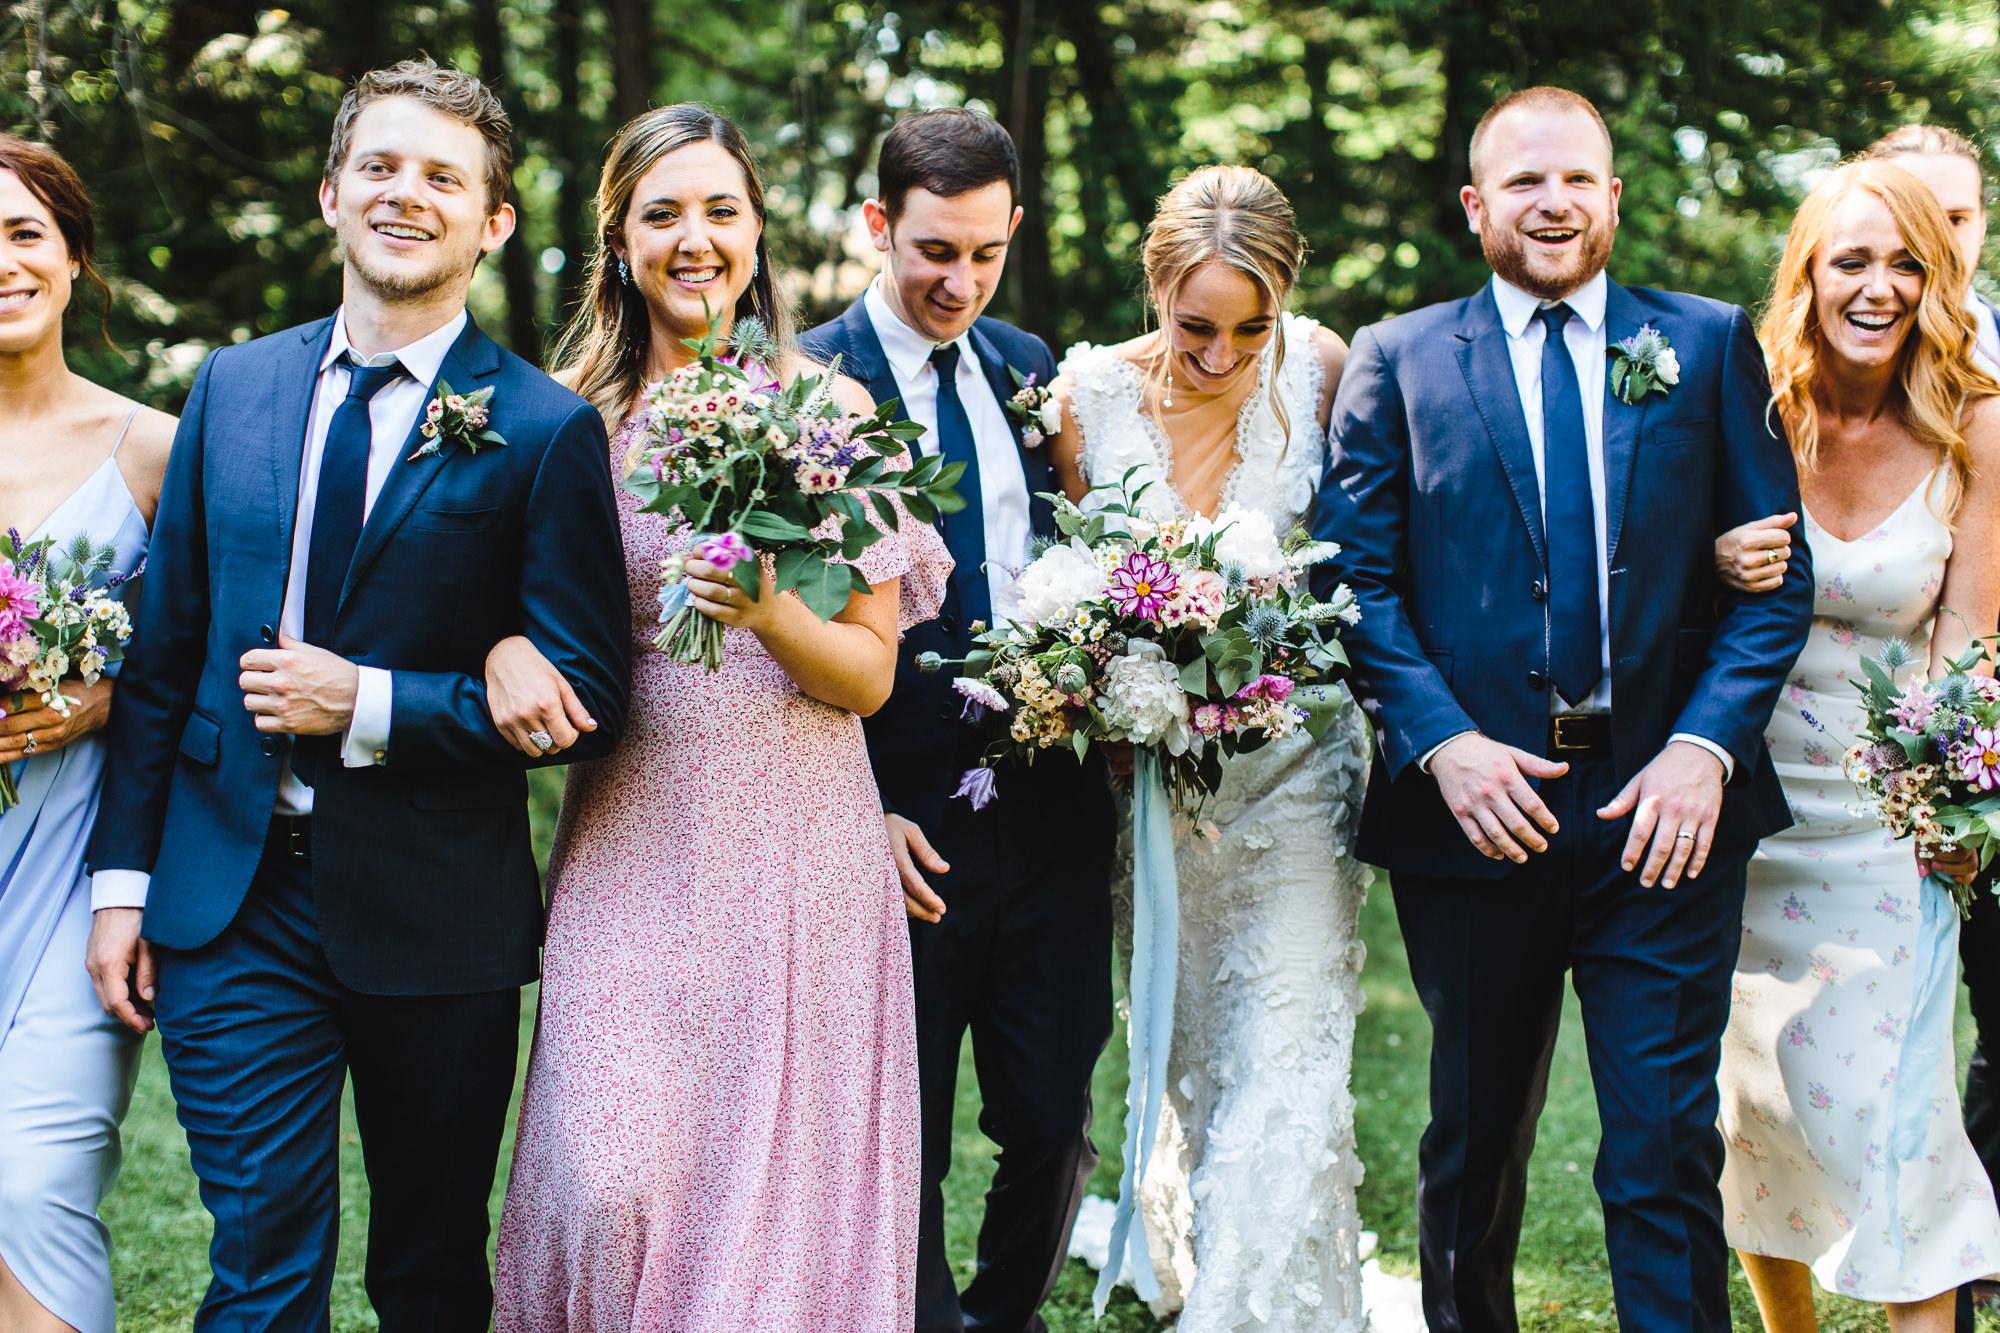 connecticut-summer-lake-wedding-emily-kirke-photography-upstyle (73 of 181).jpg